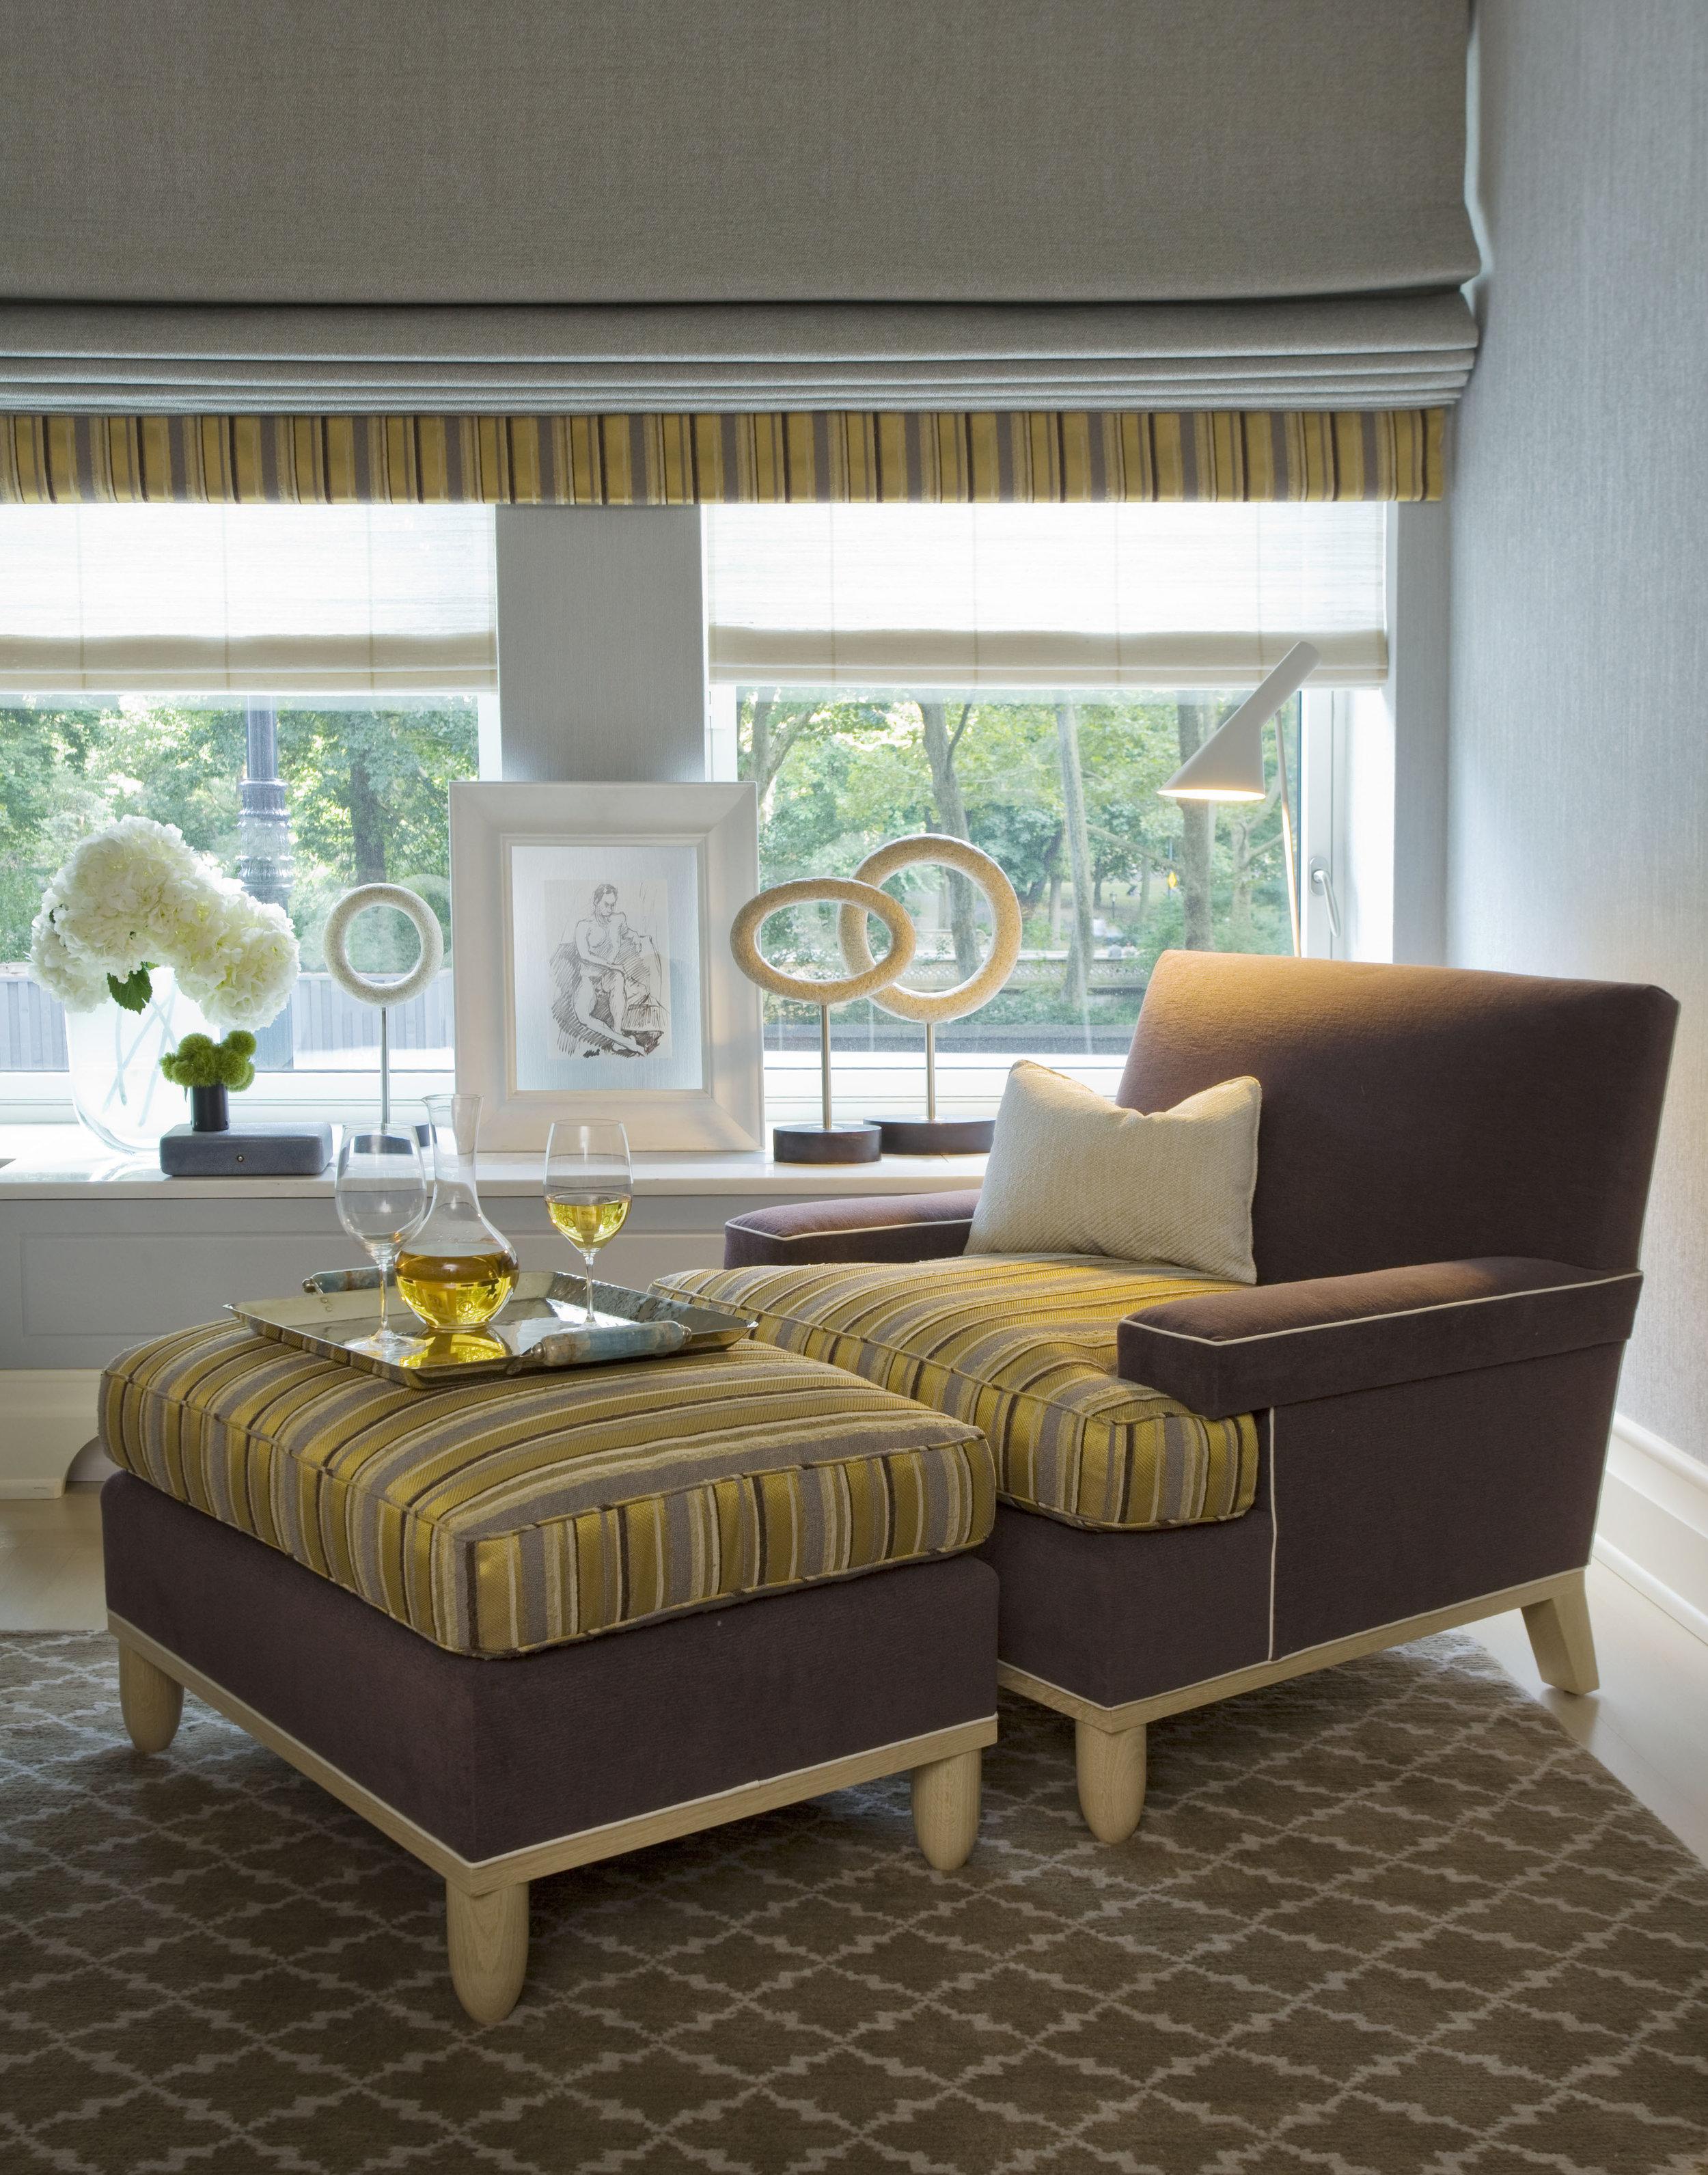 24 - CPW-29 Master Bedroom.jpg